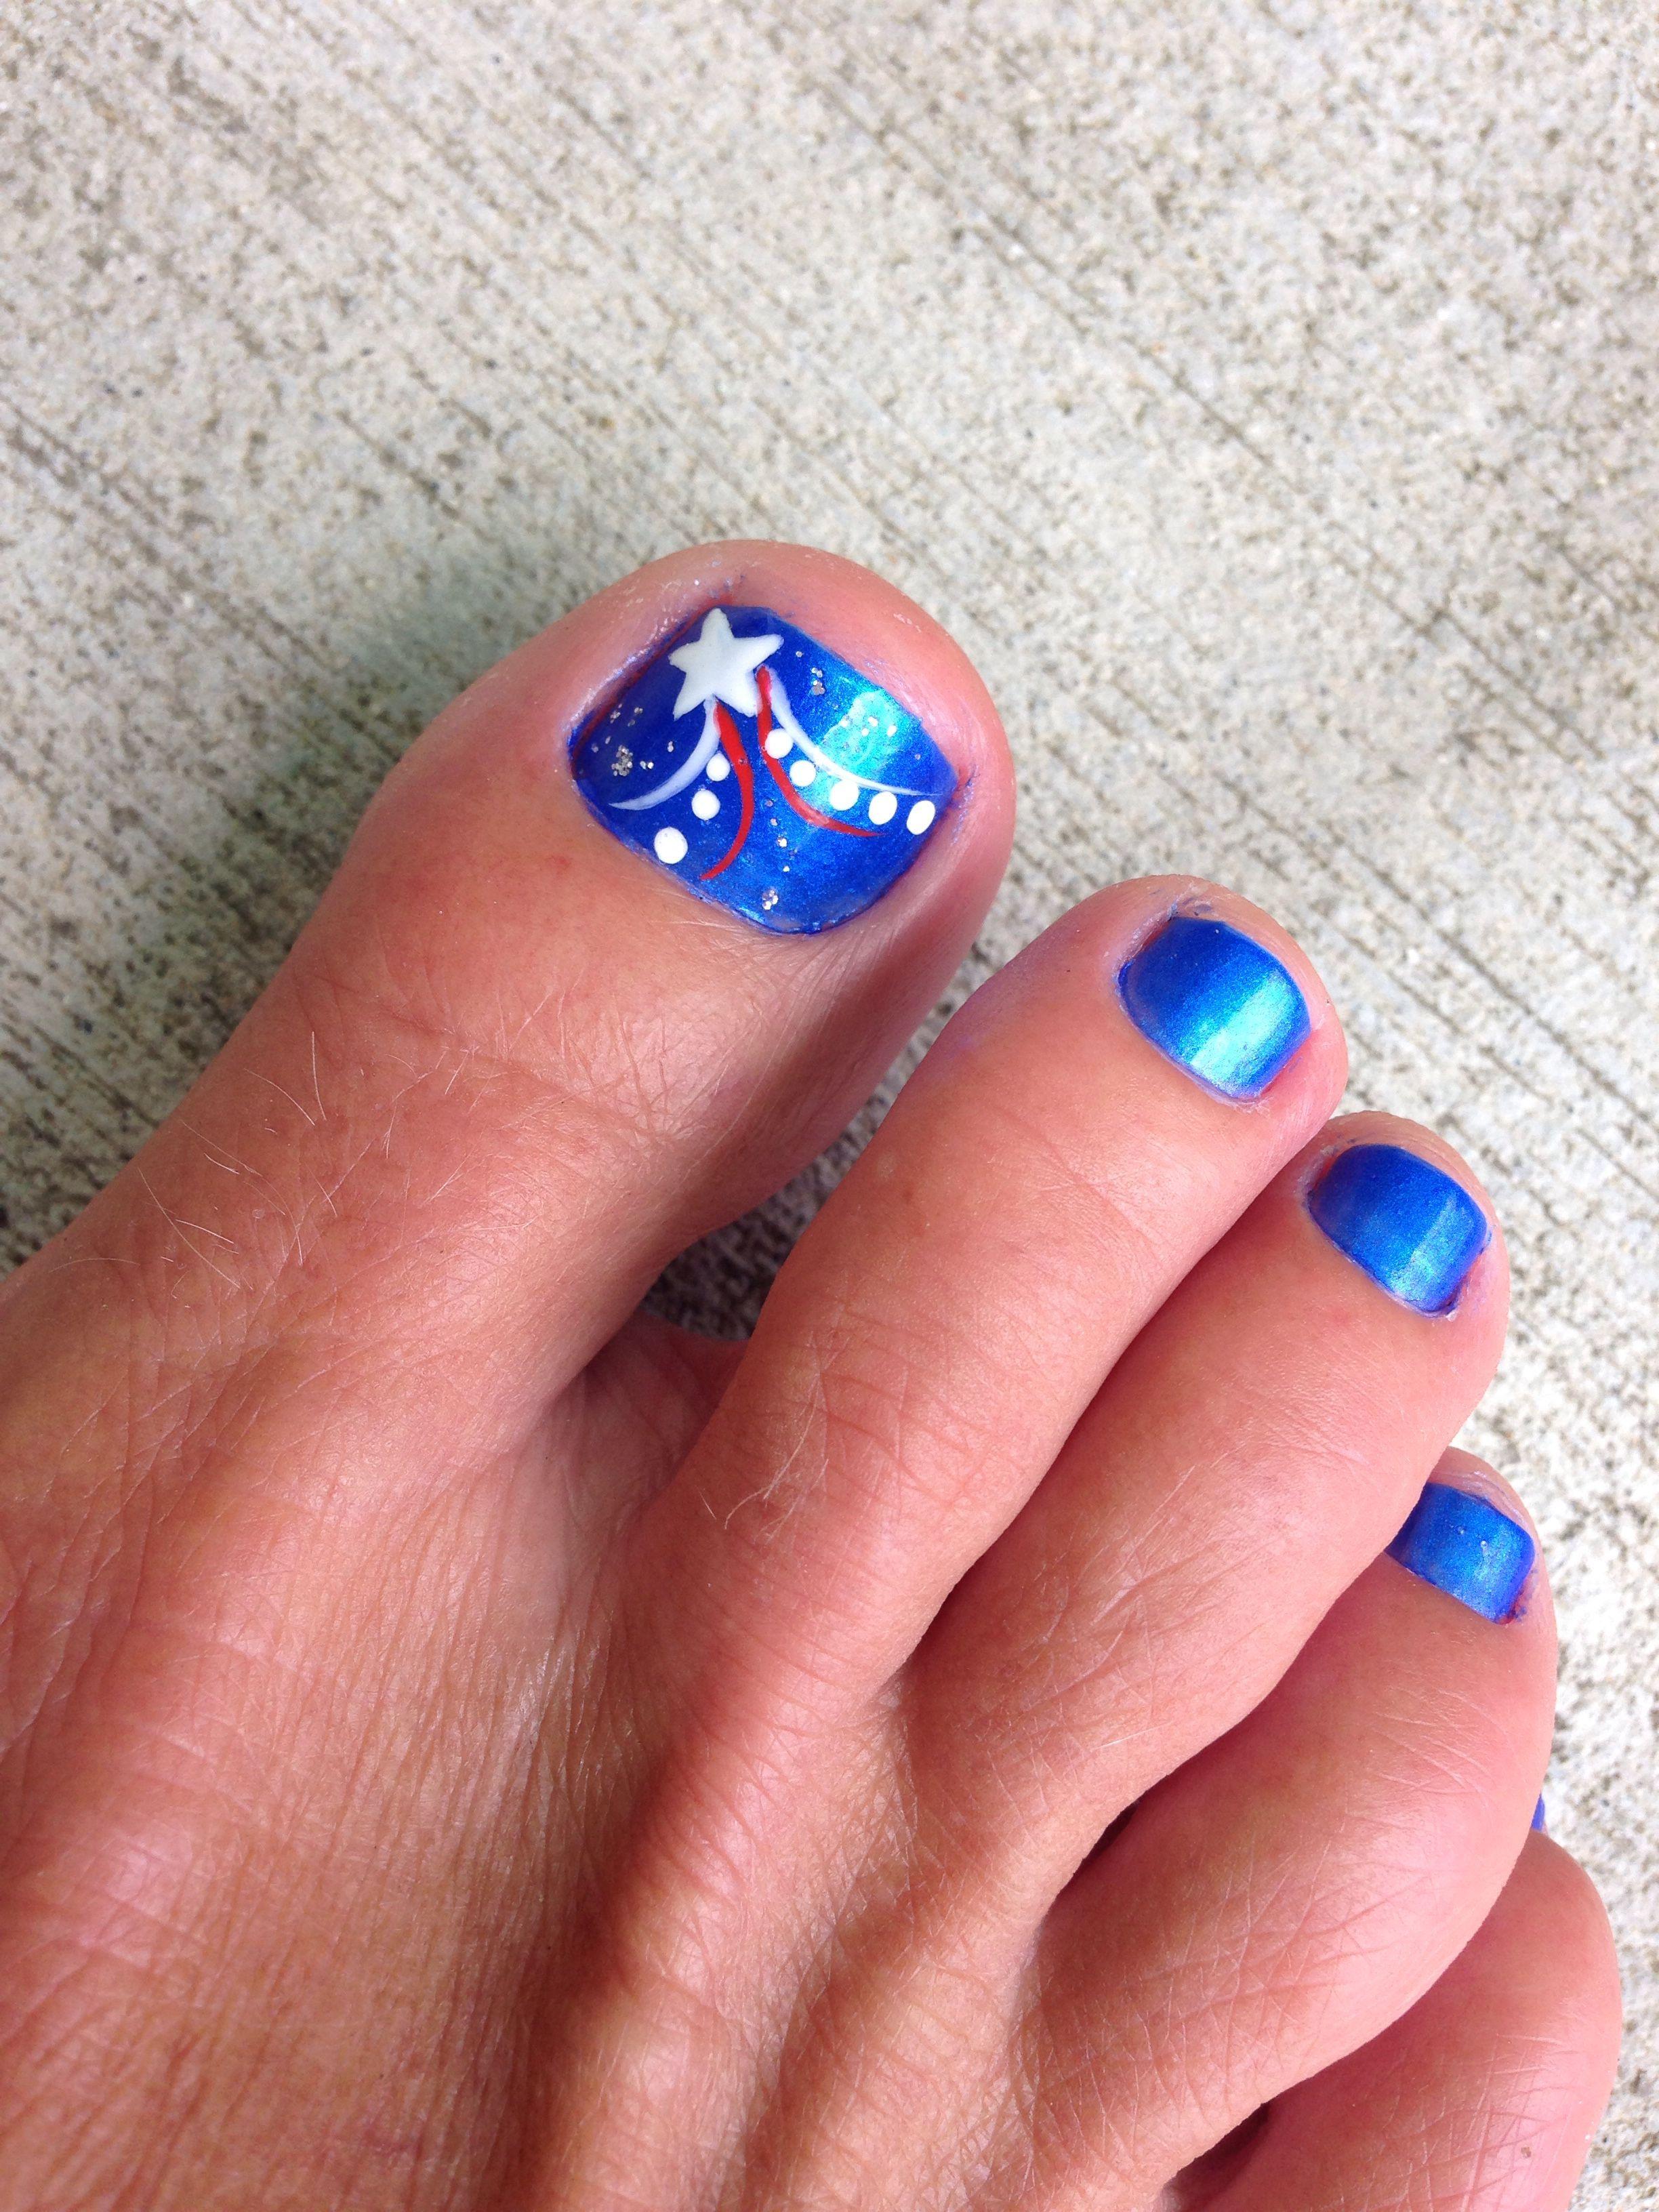 Hugedomains Com Shop For Over 300 000 Premium Domains Summer Toe Nails Pedicure Nail Art Pedicure Nails